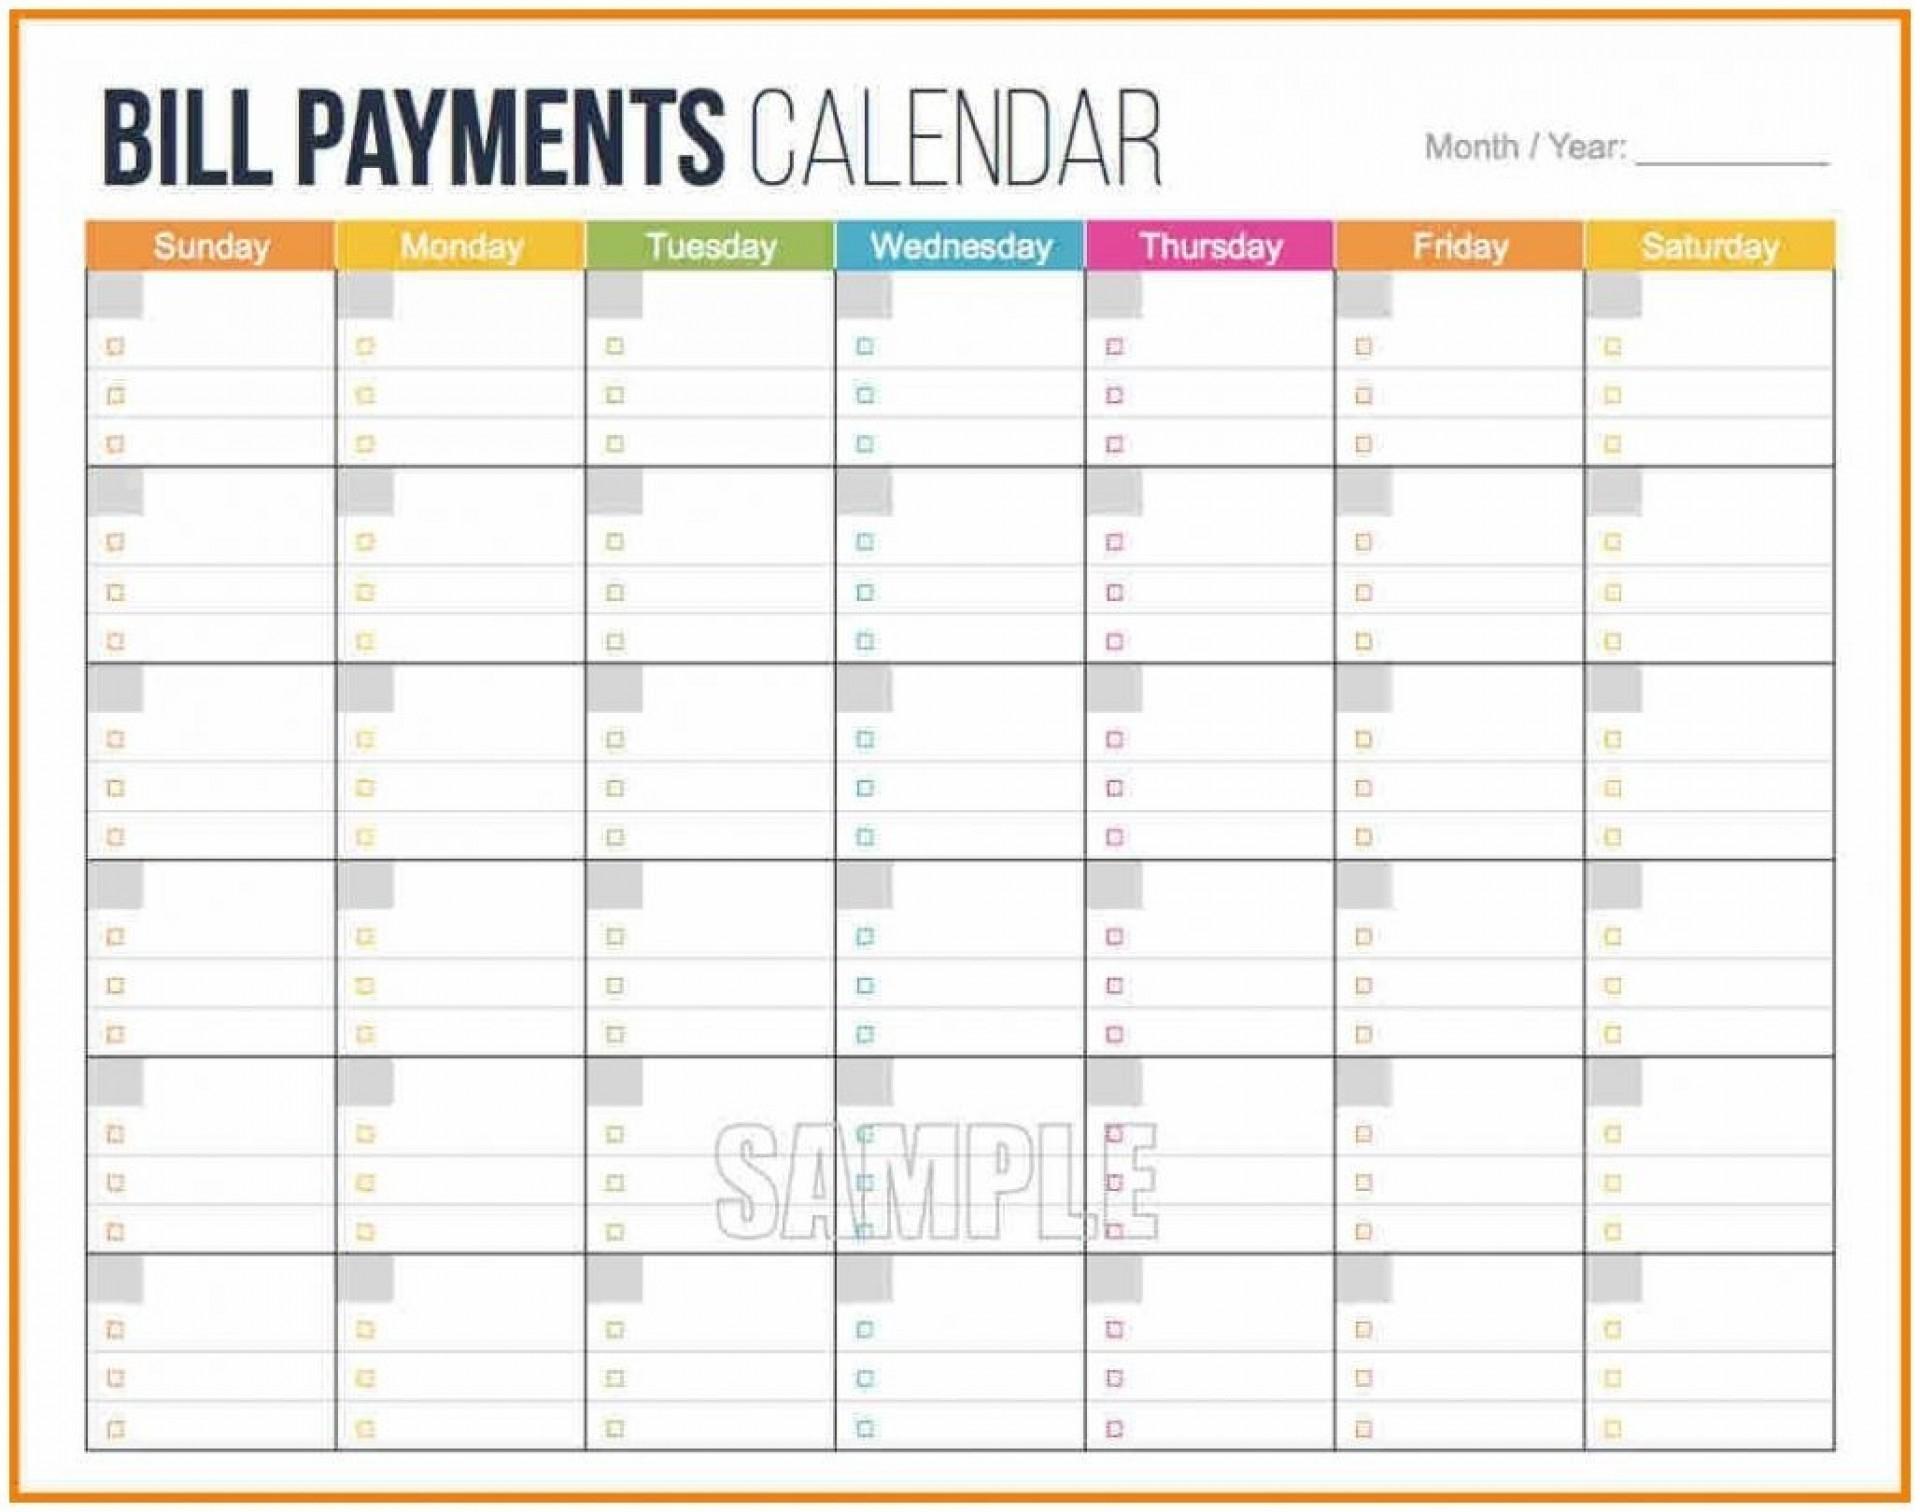 015 Template Ideas Billment Calendar Fitted Photo Schedule